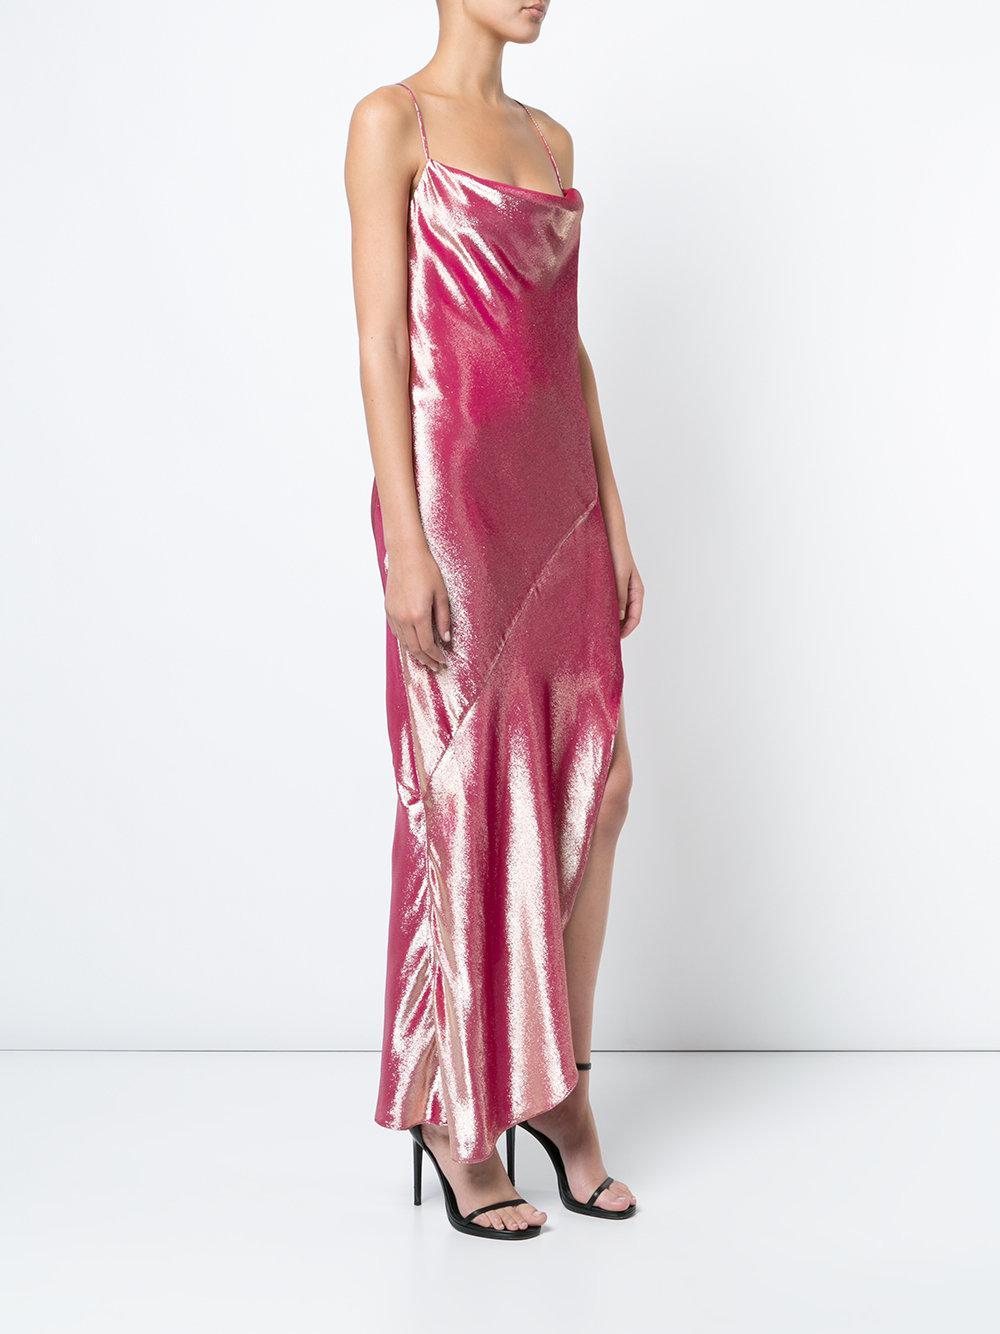 Haney Goldie rosa Vestido púrpura y asimétrico 0zEnwqT